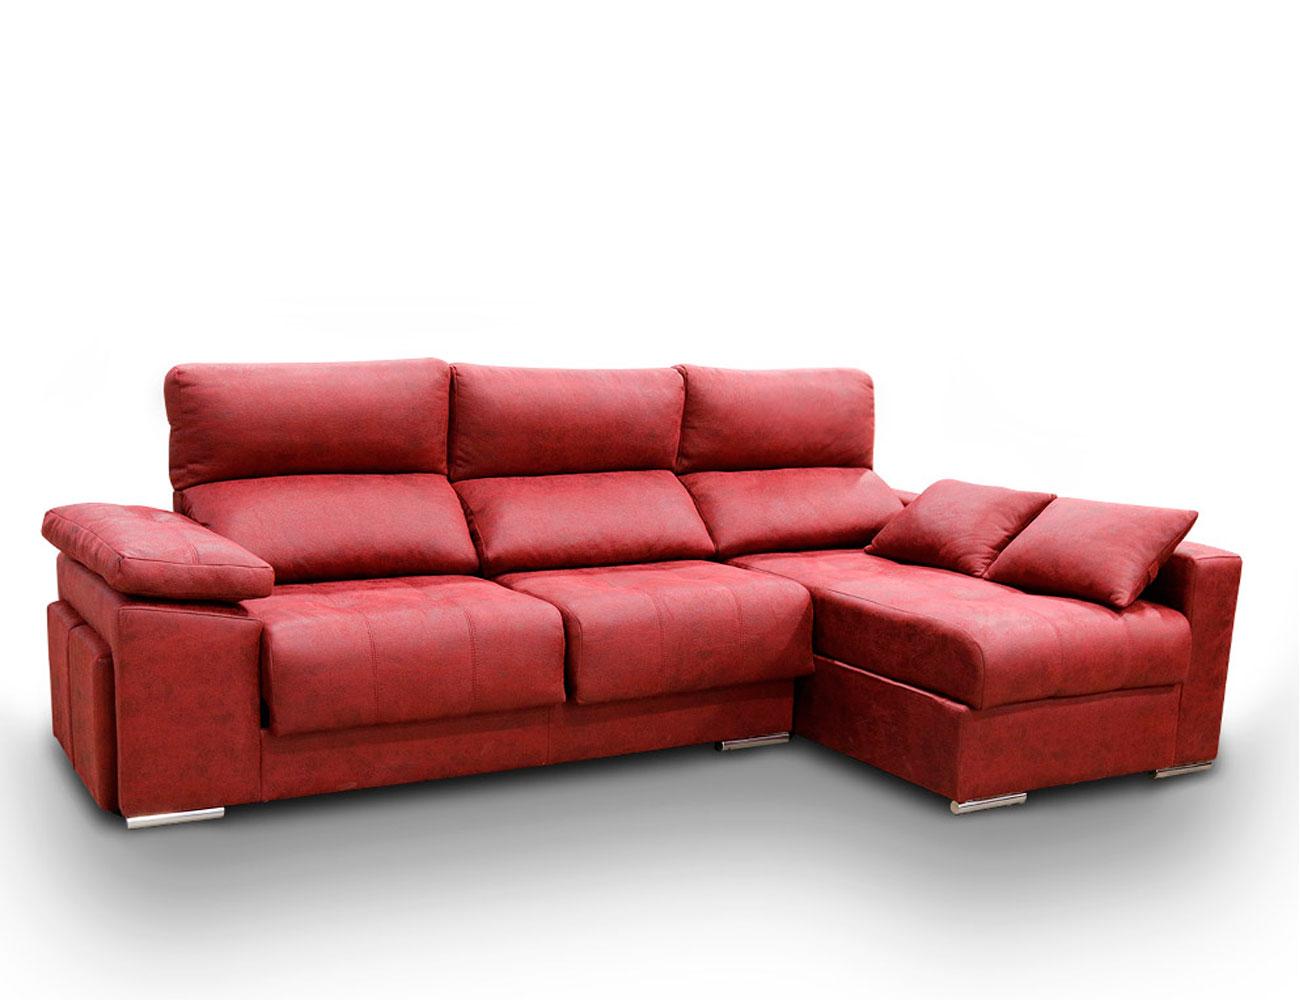 Sofa chaiselongue anti manchas rojo granate6